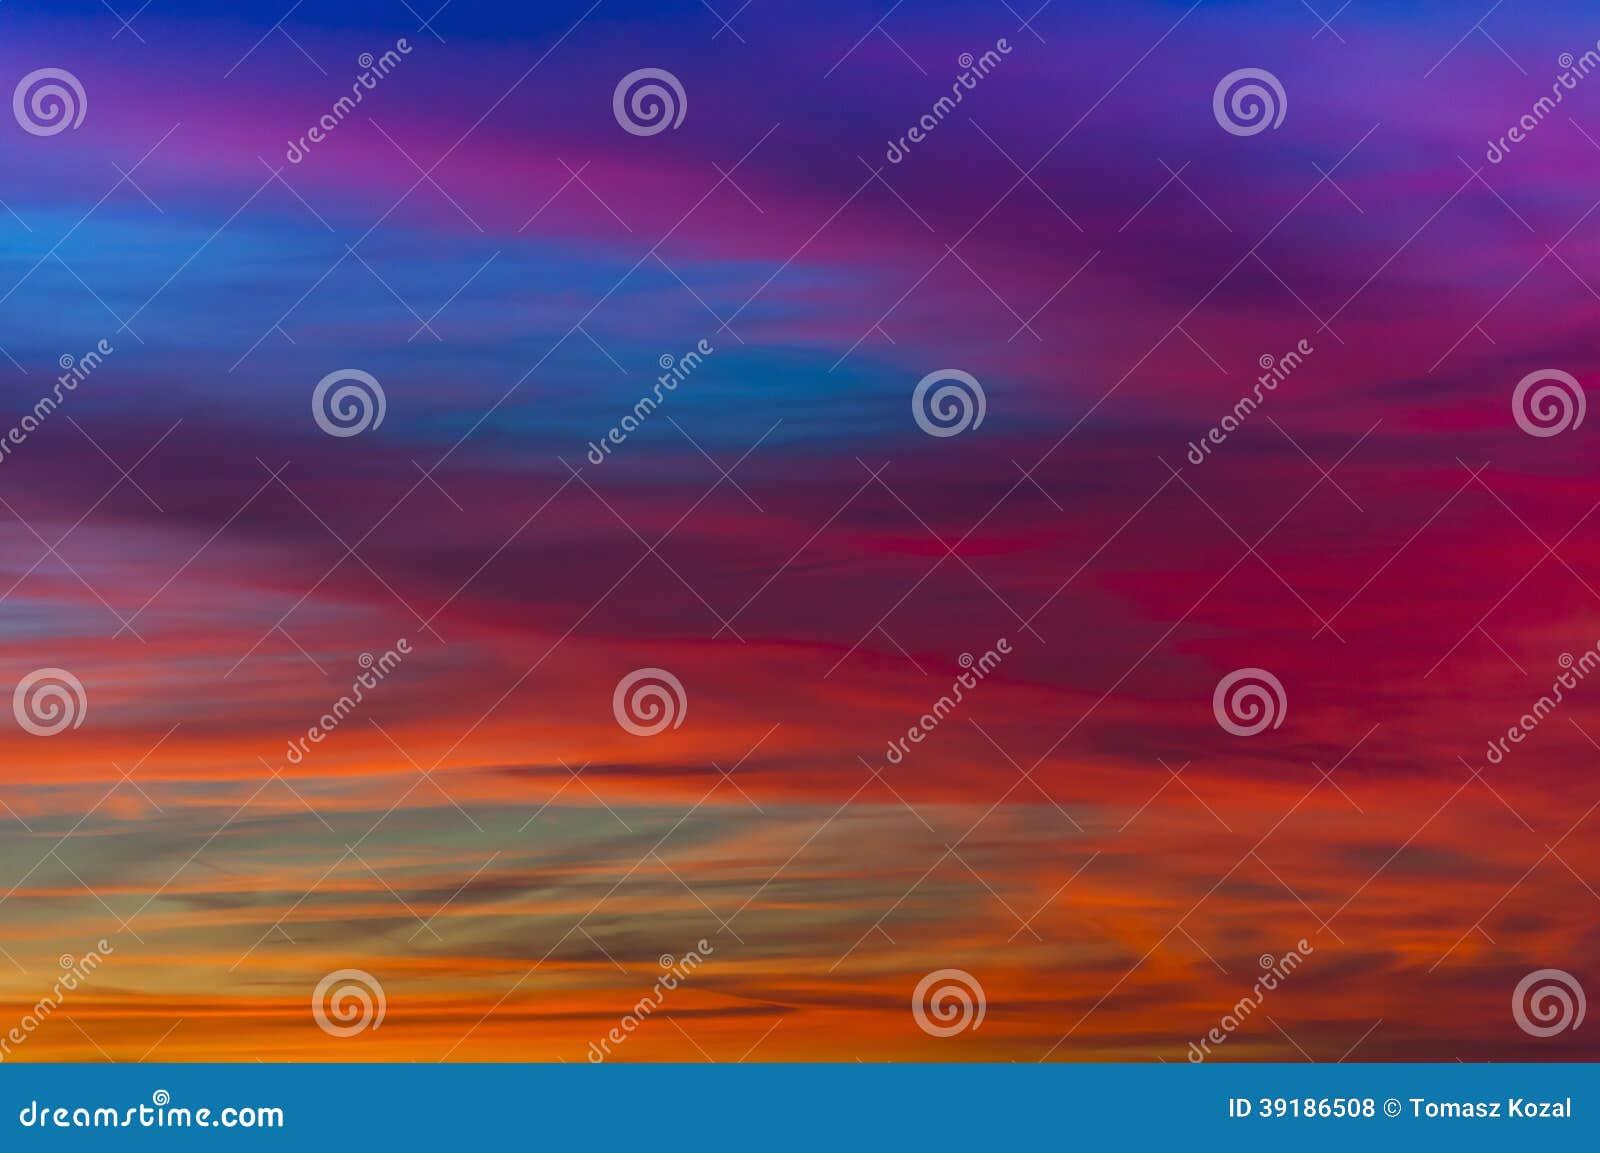 Vivid sunset stock photo  Image of vivid, colorful, nature - 39186508